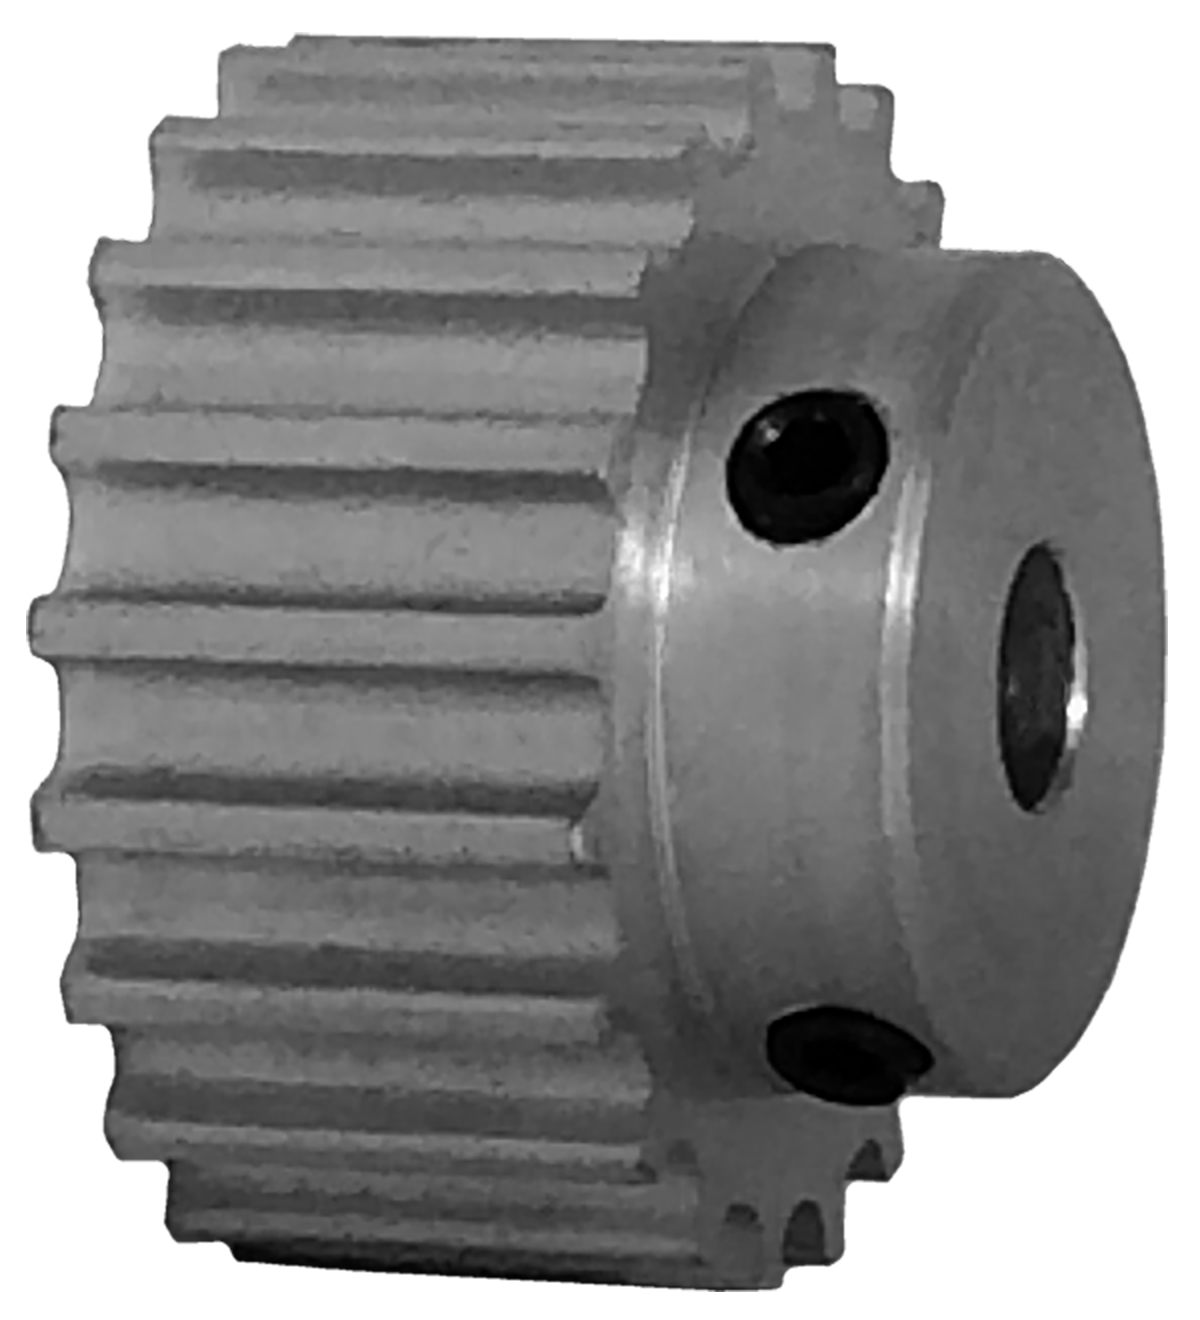 20-5M09-6A3 - Aluminum Powerhouse®HTD® Pulleys